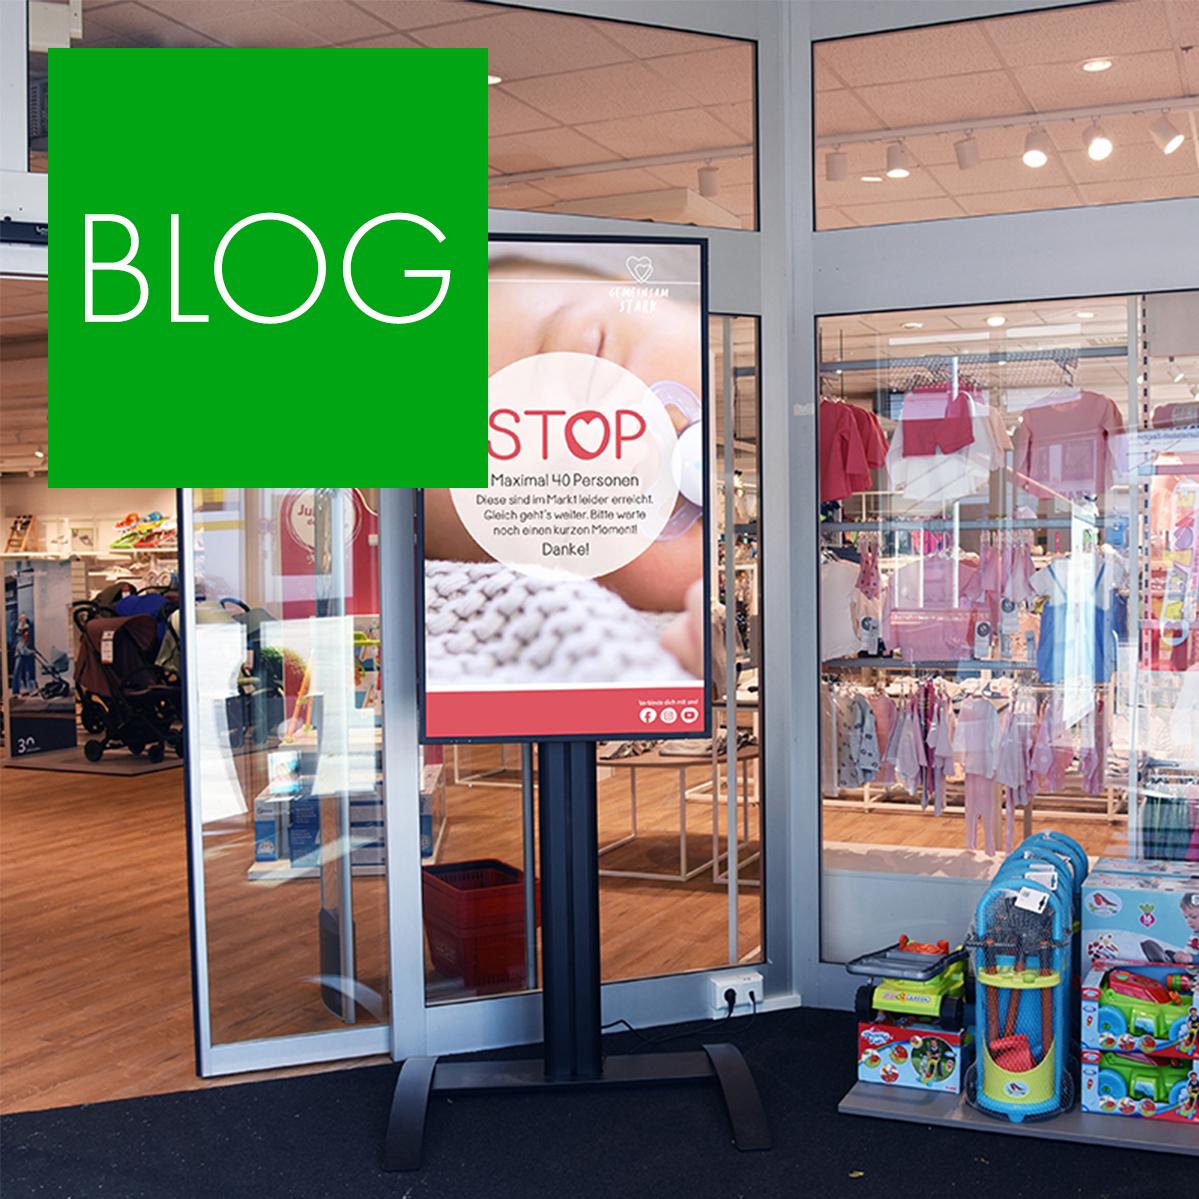 Blogpost: Kundenampel bei BabyOne